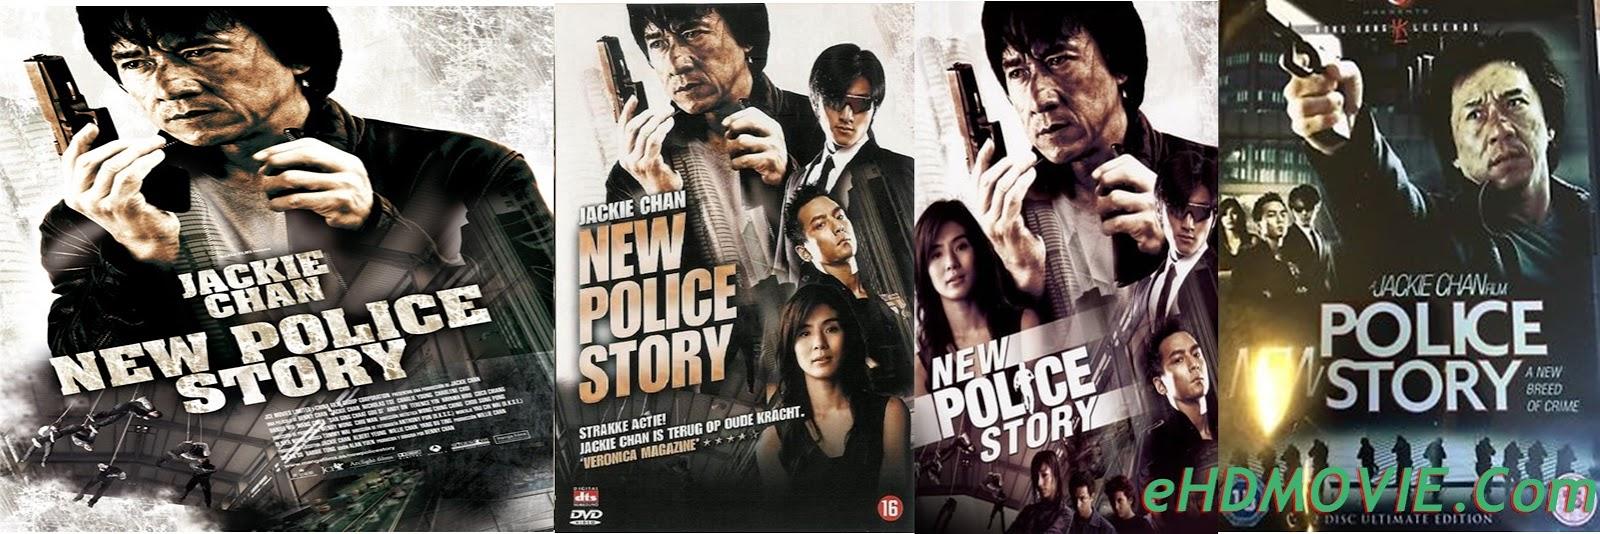 New Police Story 2004 Full Movie Dual Audio [Hindi – English] 720p – 480p ORG BRRip 350MB – 750MB ESubs Free Download